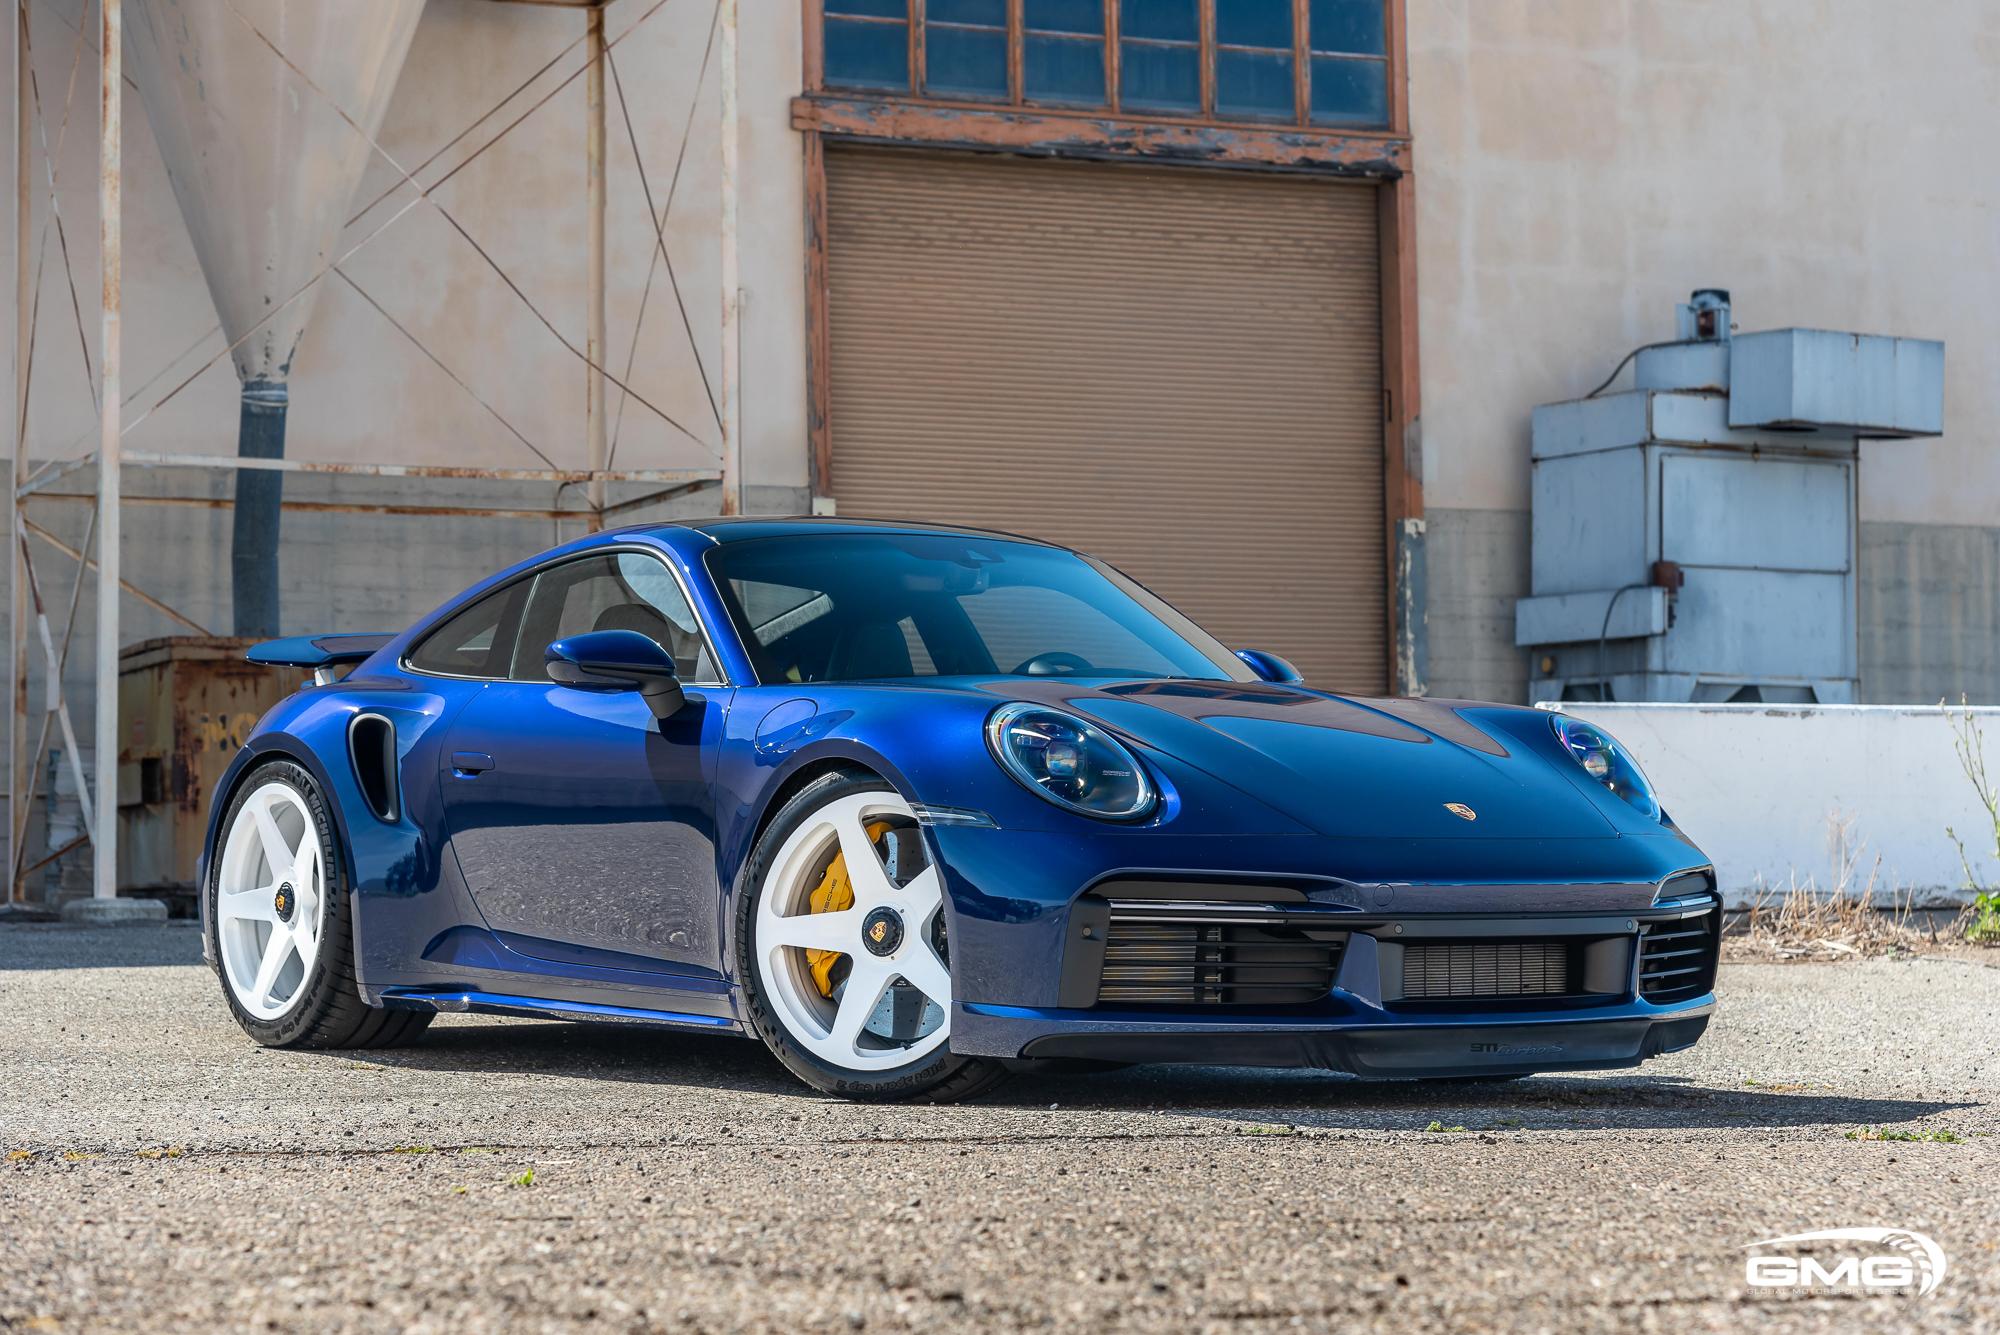 Gentian Blue Porsche 992 Turbo S